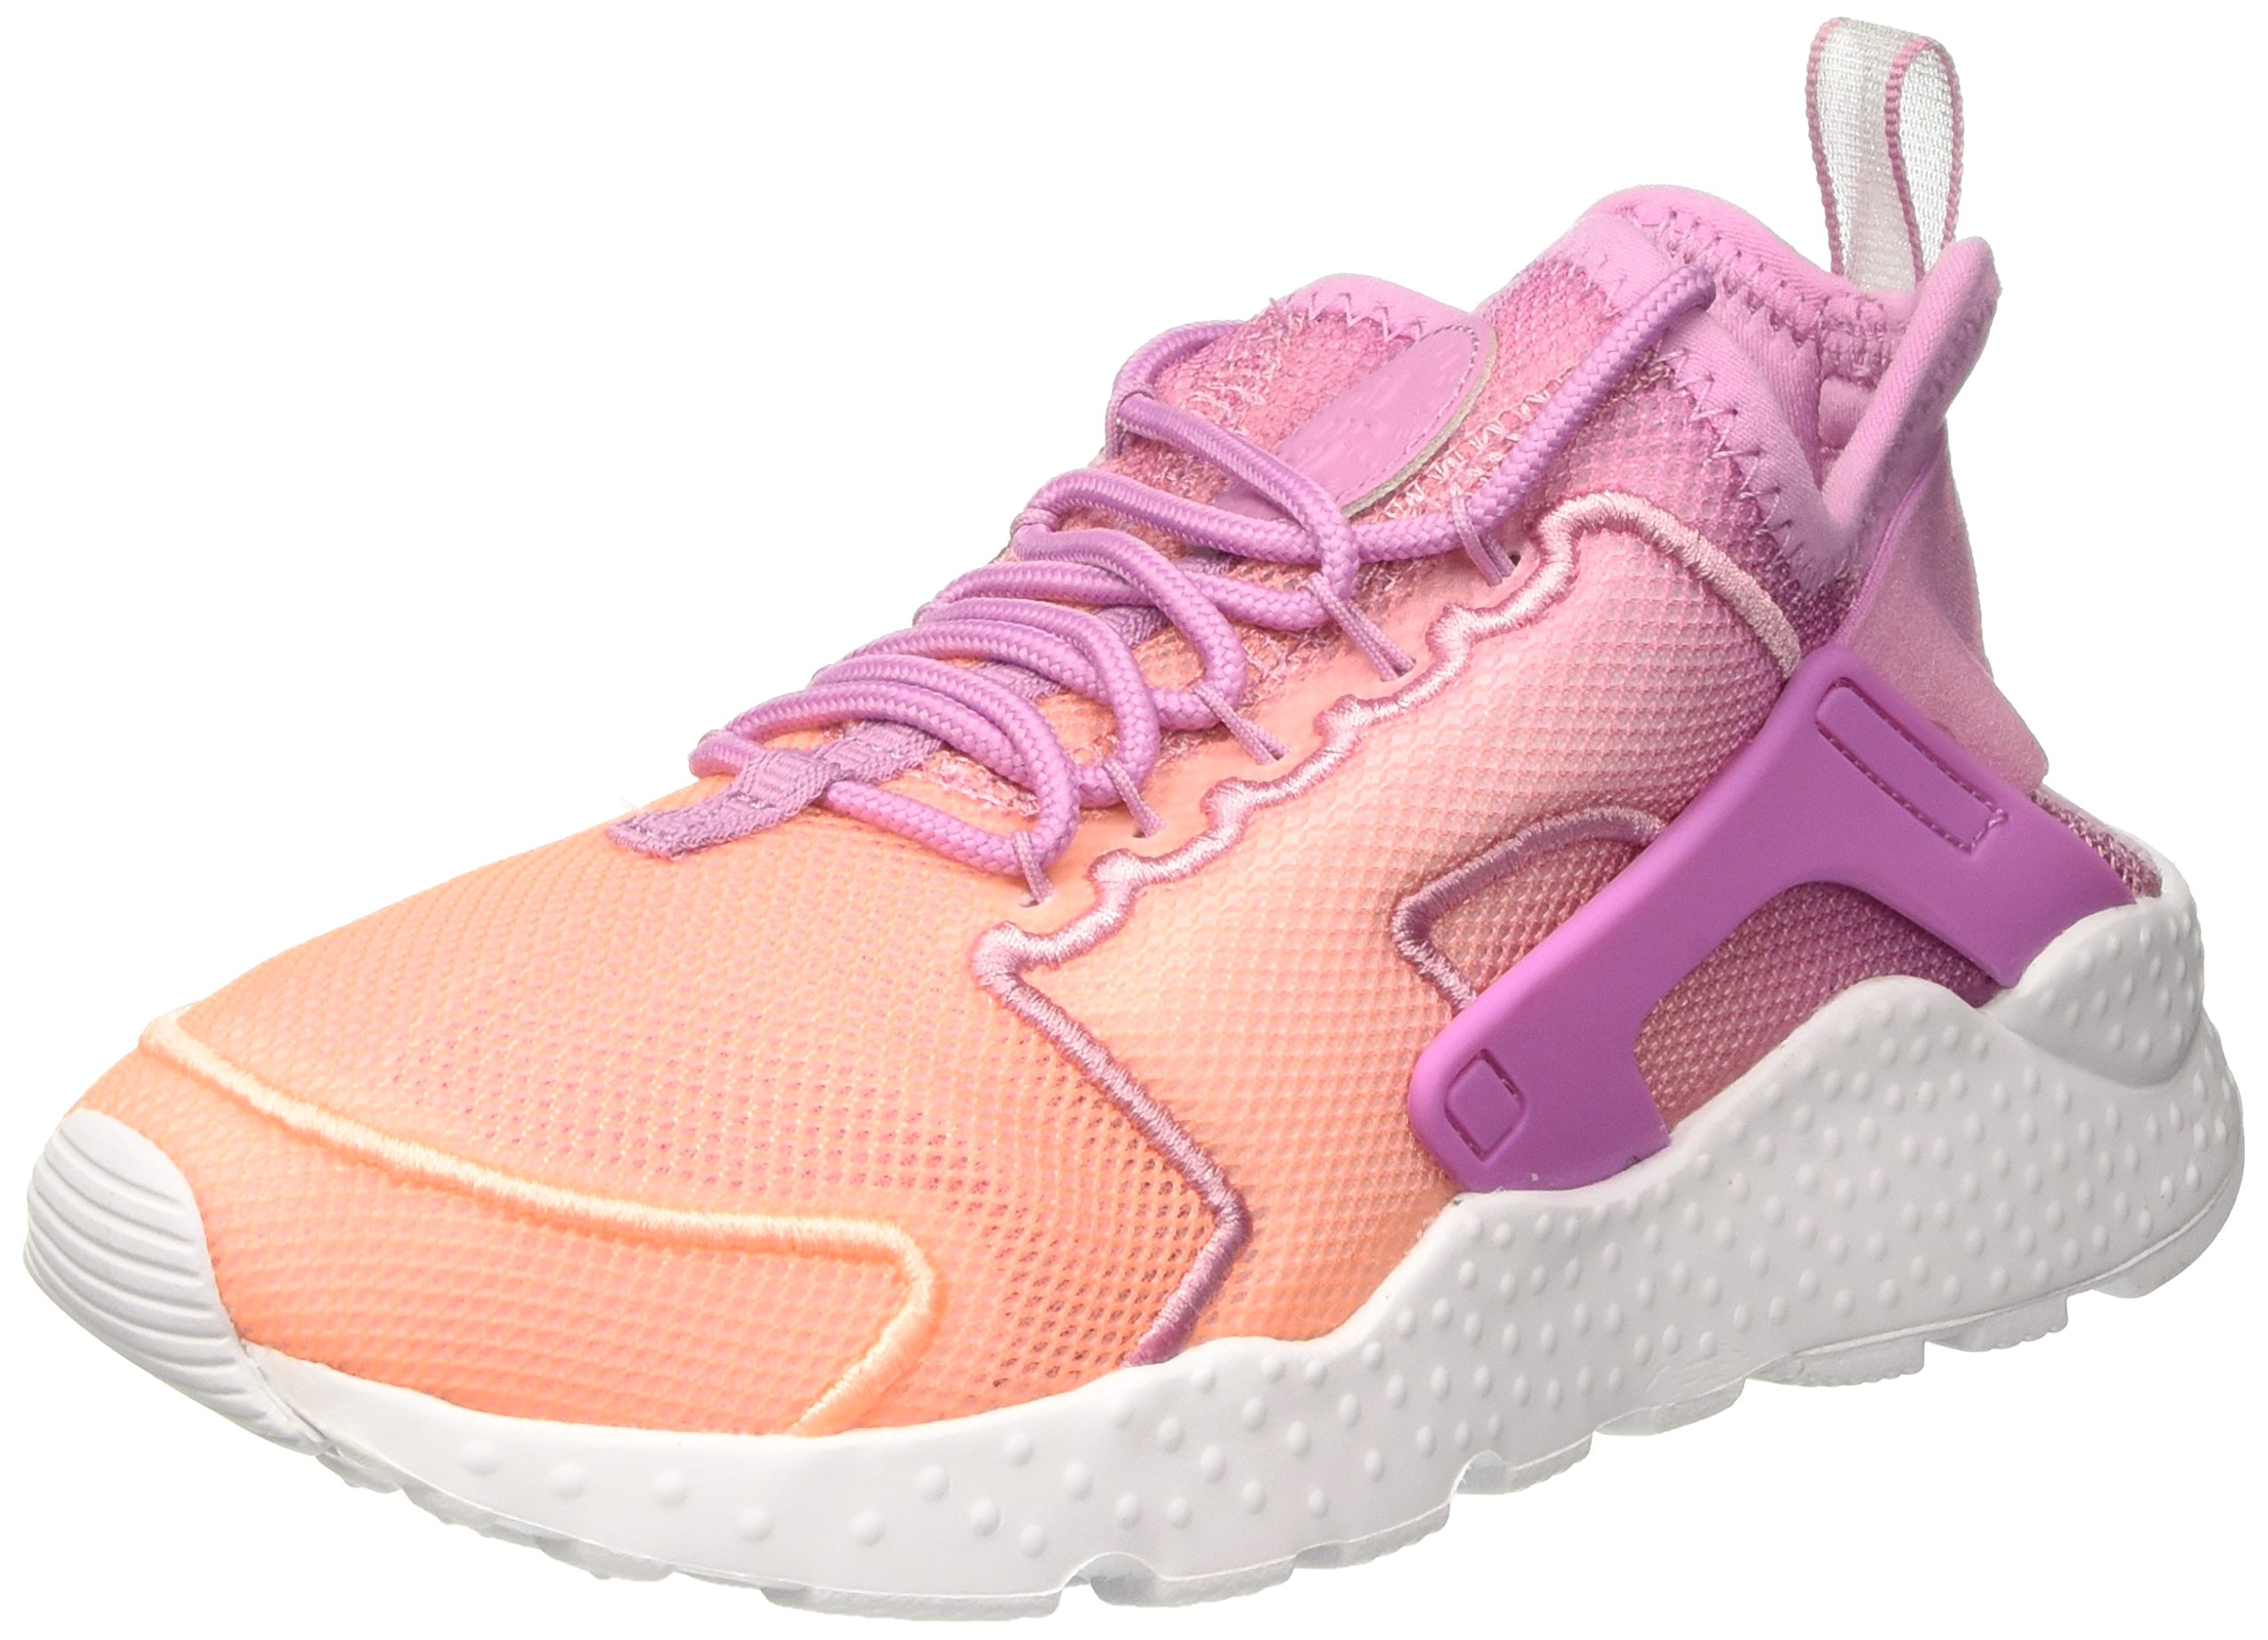 sale retailer aa92c 17e75 Nike Damen WMNS Air Huarache Run Ultra Br Trainer Mehrfarbig OrchidSunset  GlowWhite, 39 EU